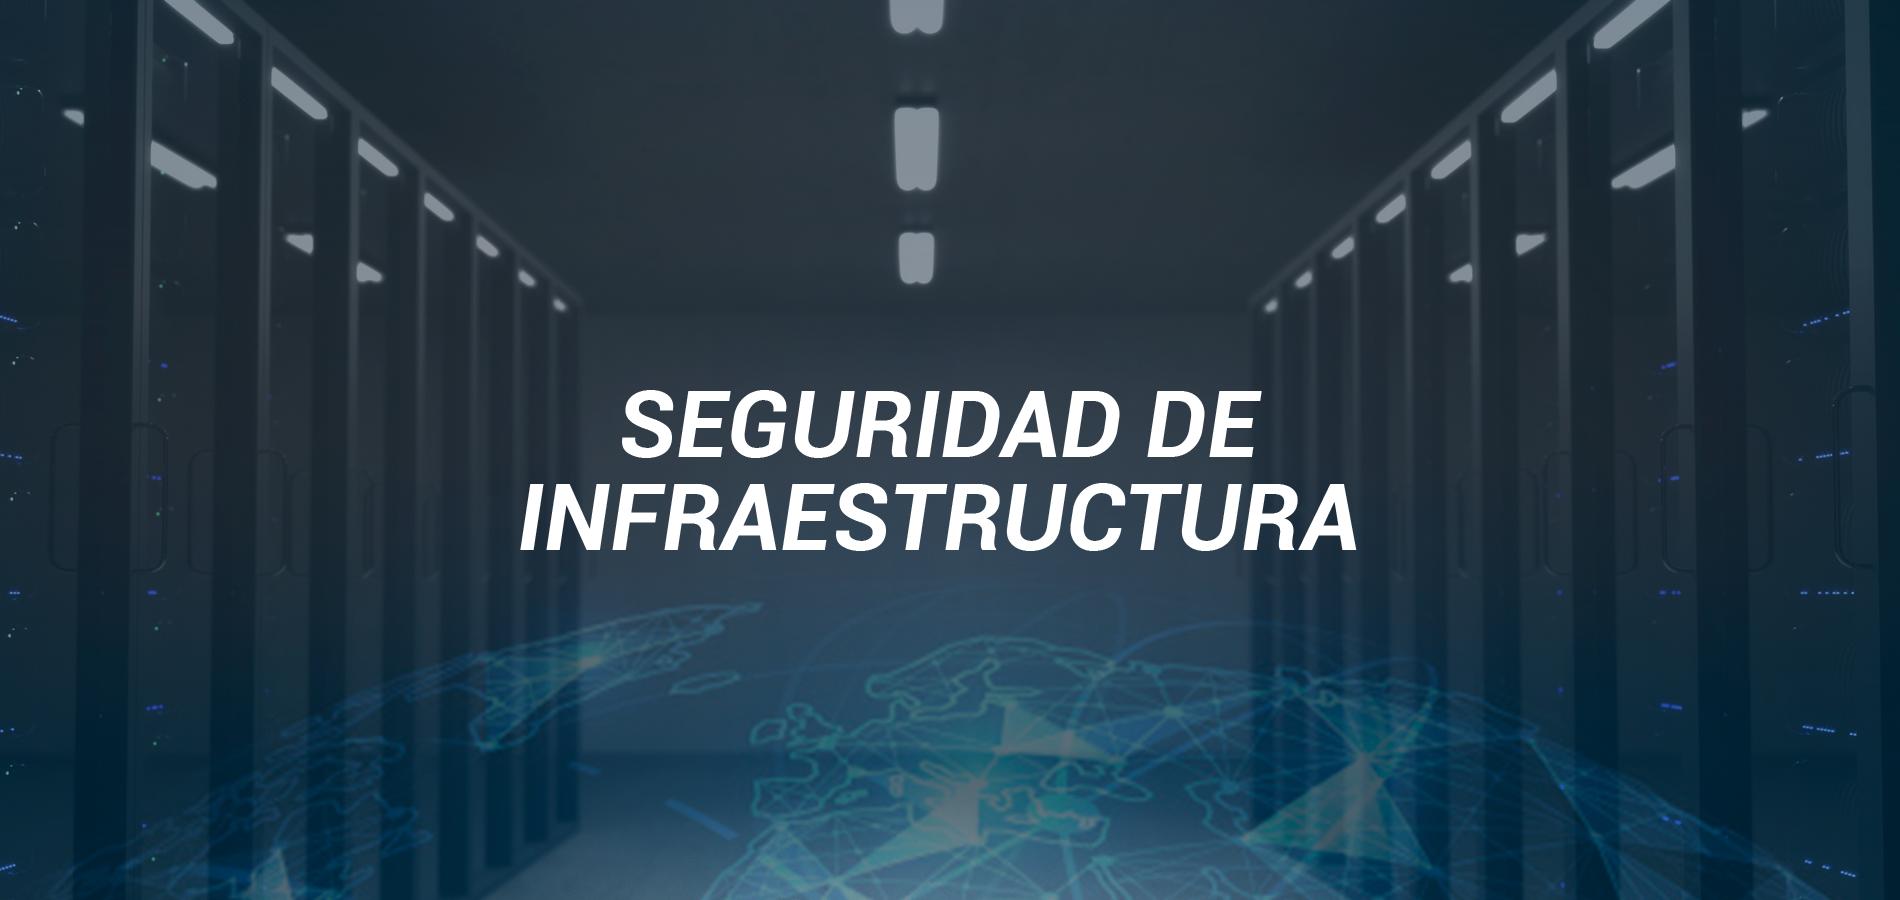 seguridad infraestructura